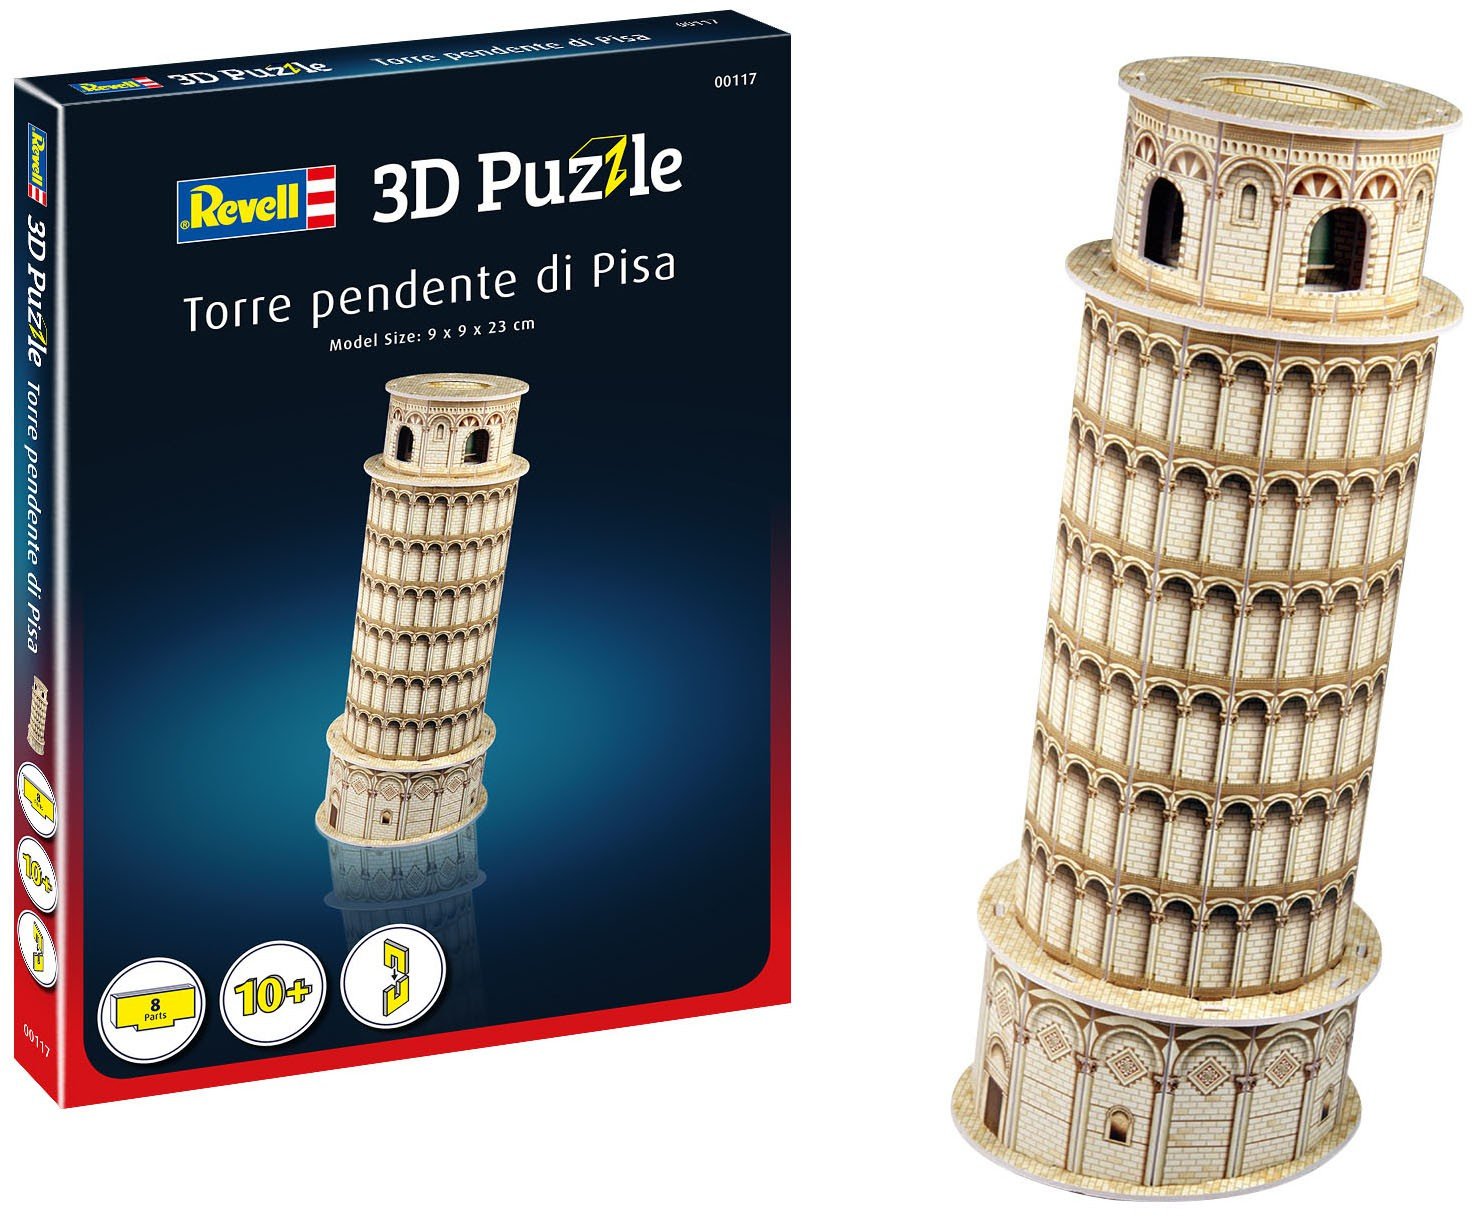 Quebra-cabeça 3D (3D Puzzle) Torre de Pisa - Revell 00117  - BLIMPS COMÉRCIO ELETRÔNICO